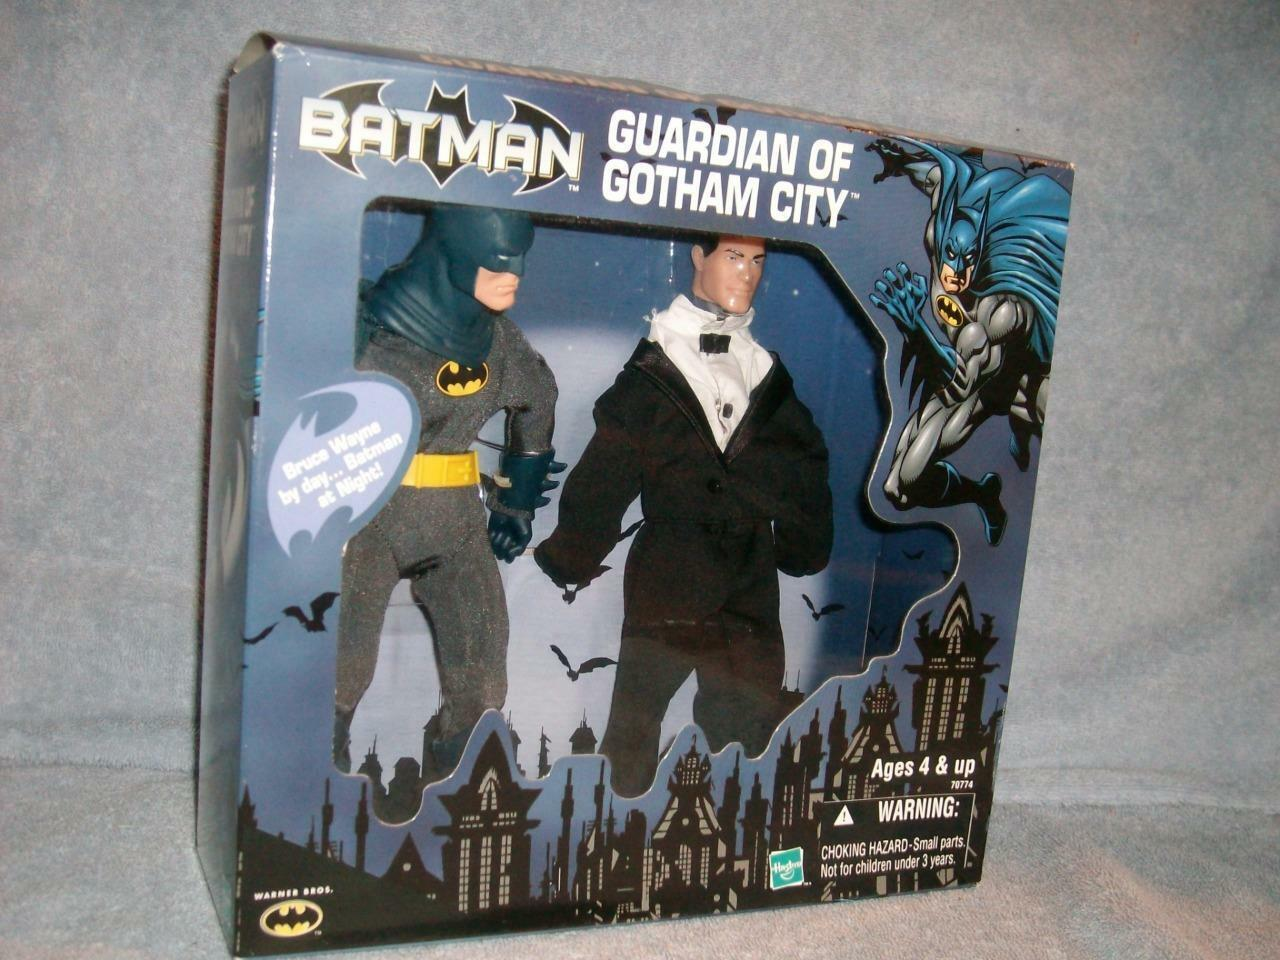 Batman By Night Bruce Wayne Day Guardian of Gotham City bluee Outfit Hasbro 2000